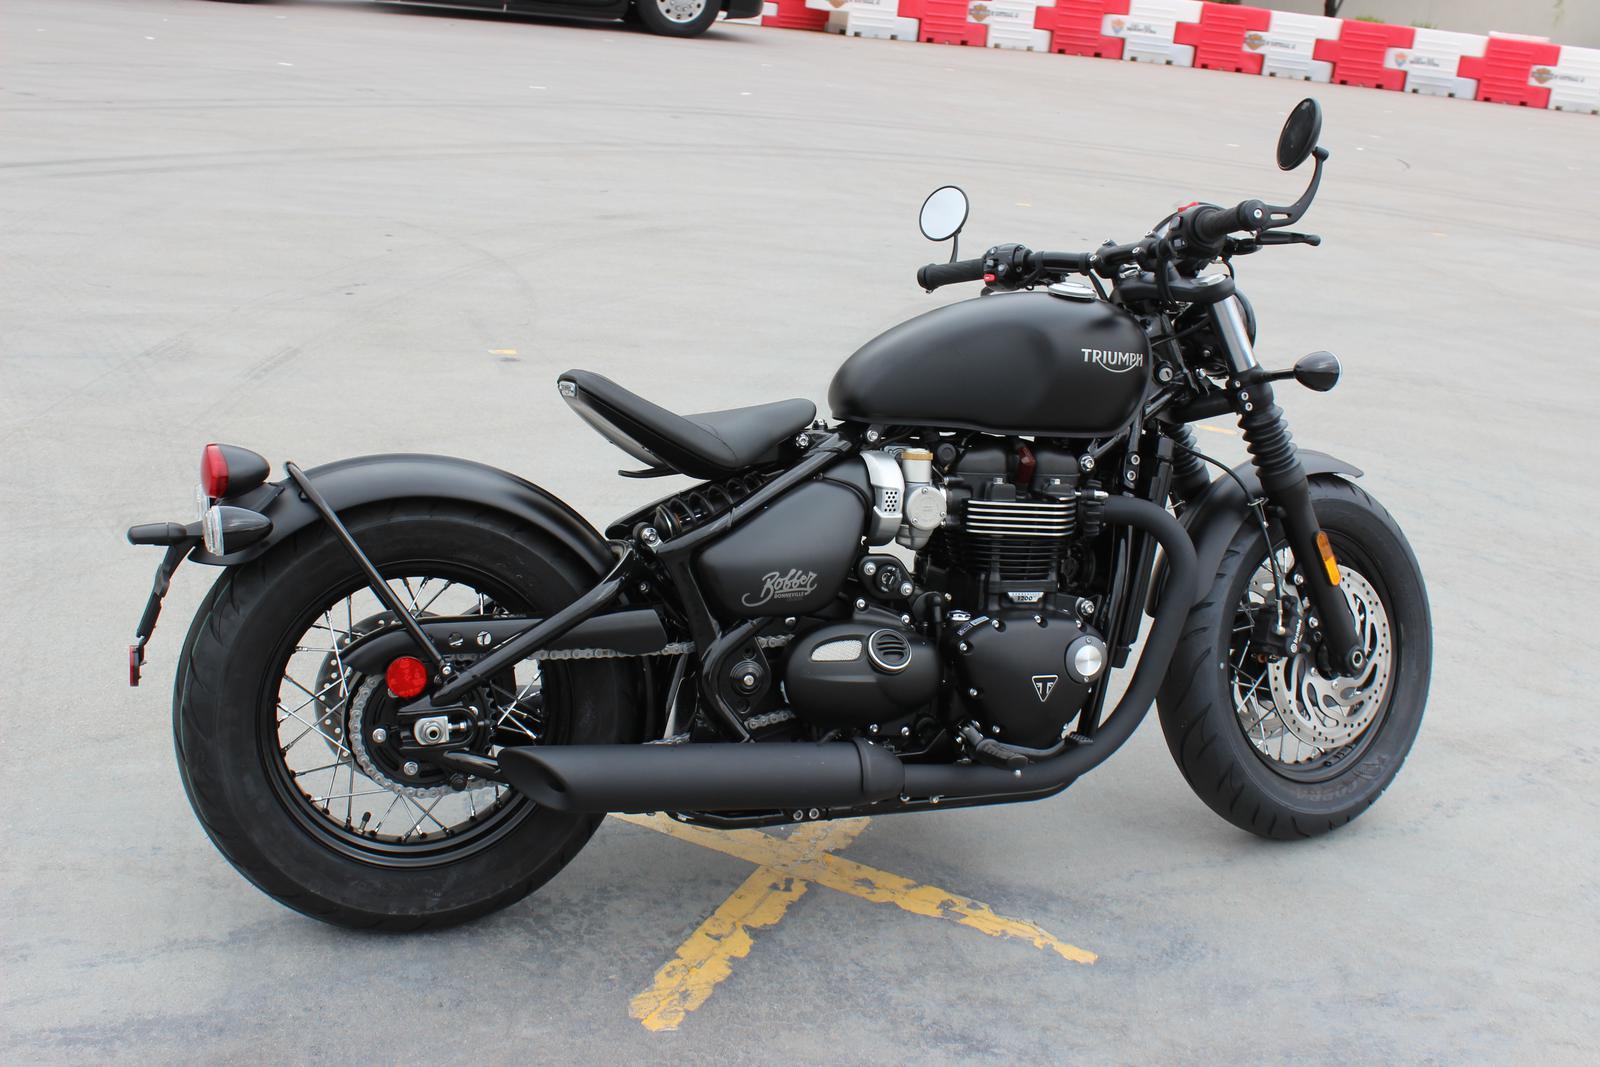 c36052407 2019 Triumph BONNEVILLE BOBBER BLACK for sale in Scottsdale